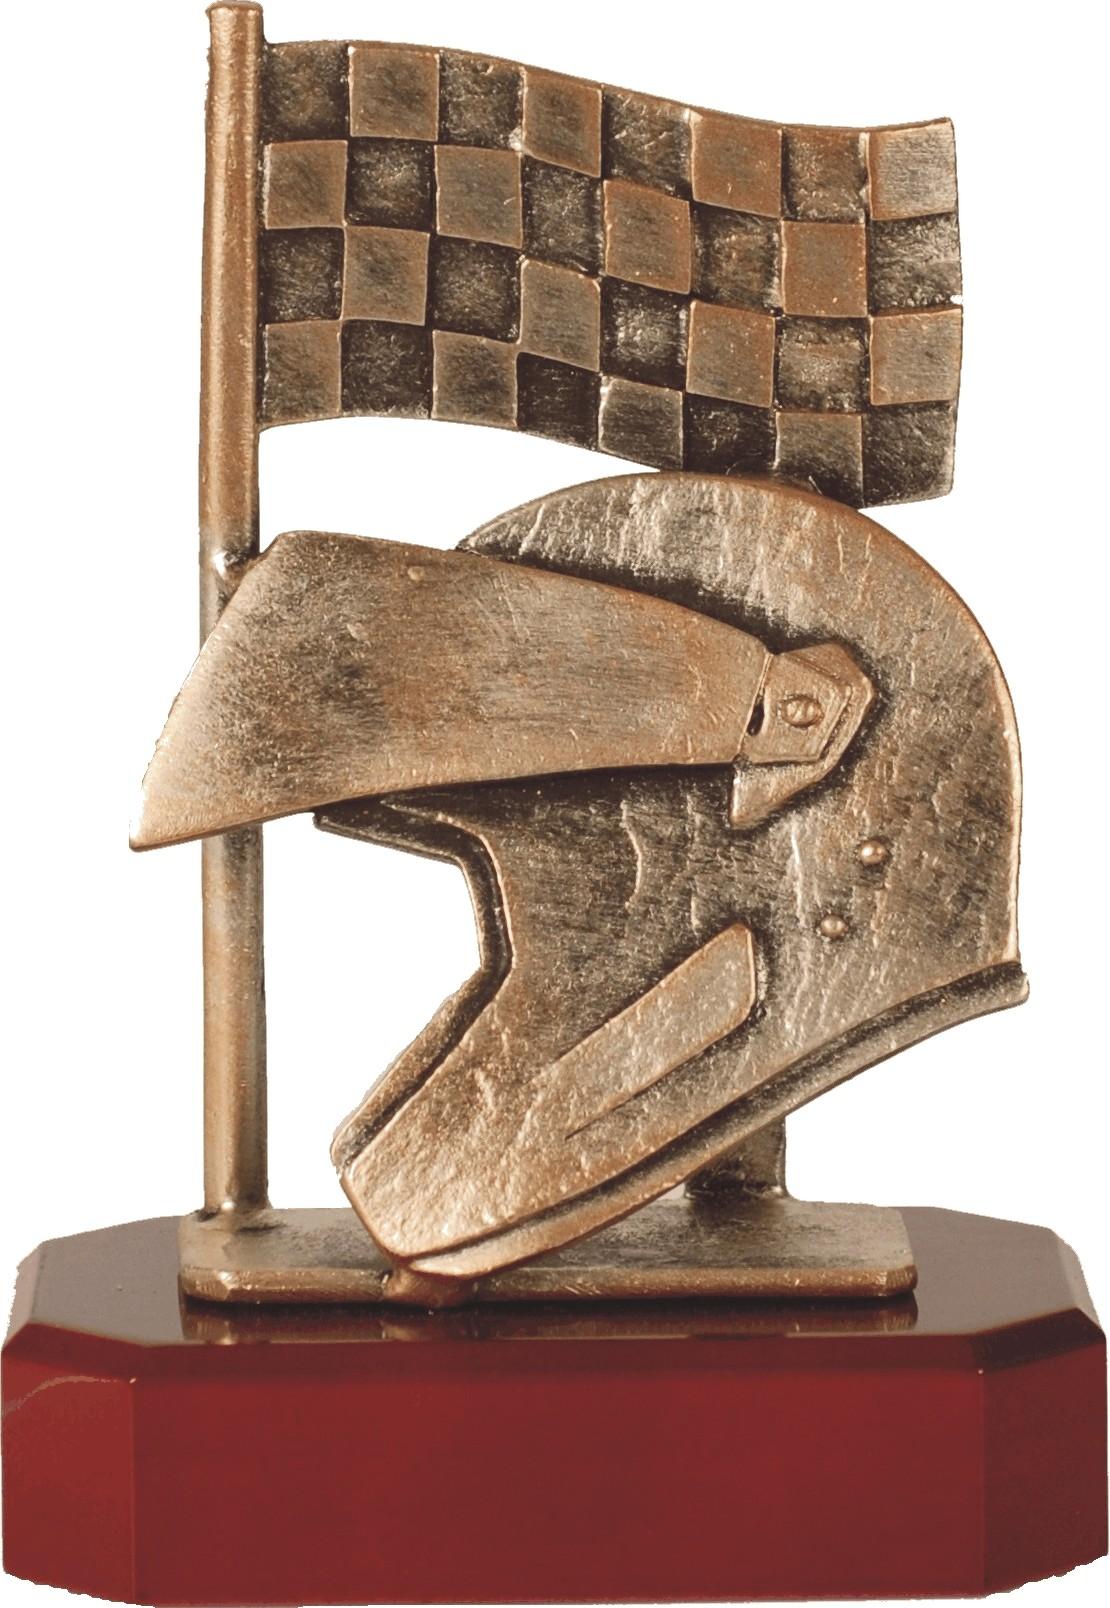 Luxe trofee ridder / finish / helm 19.5cm WBEL 203B